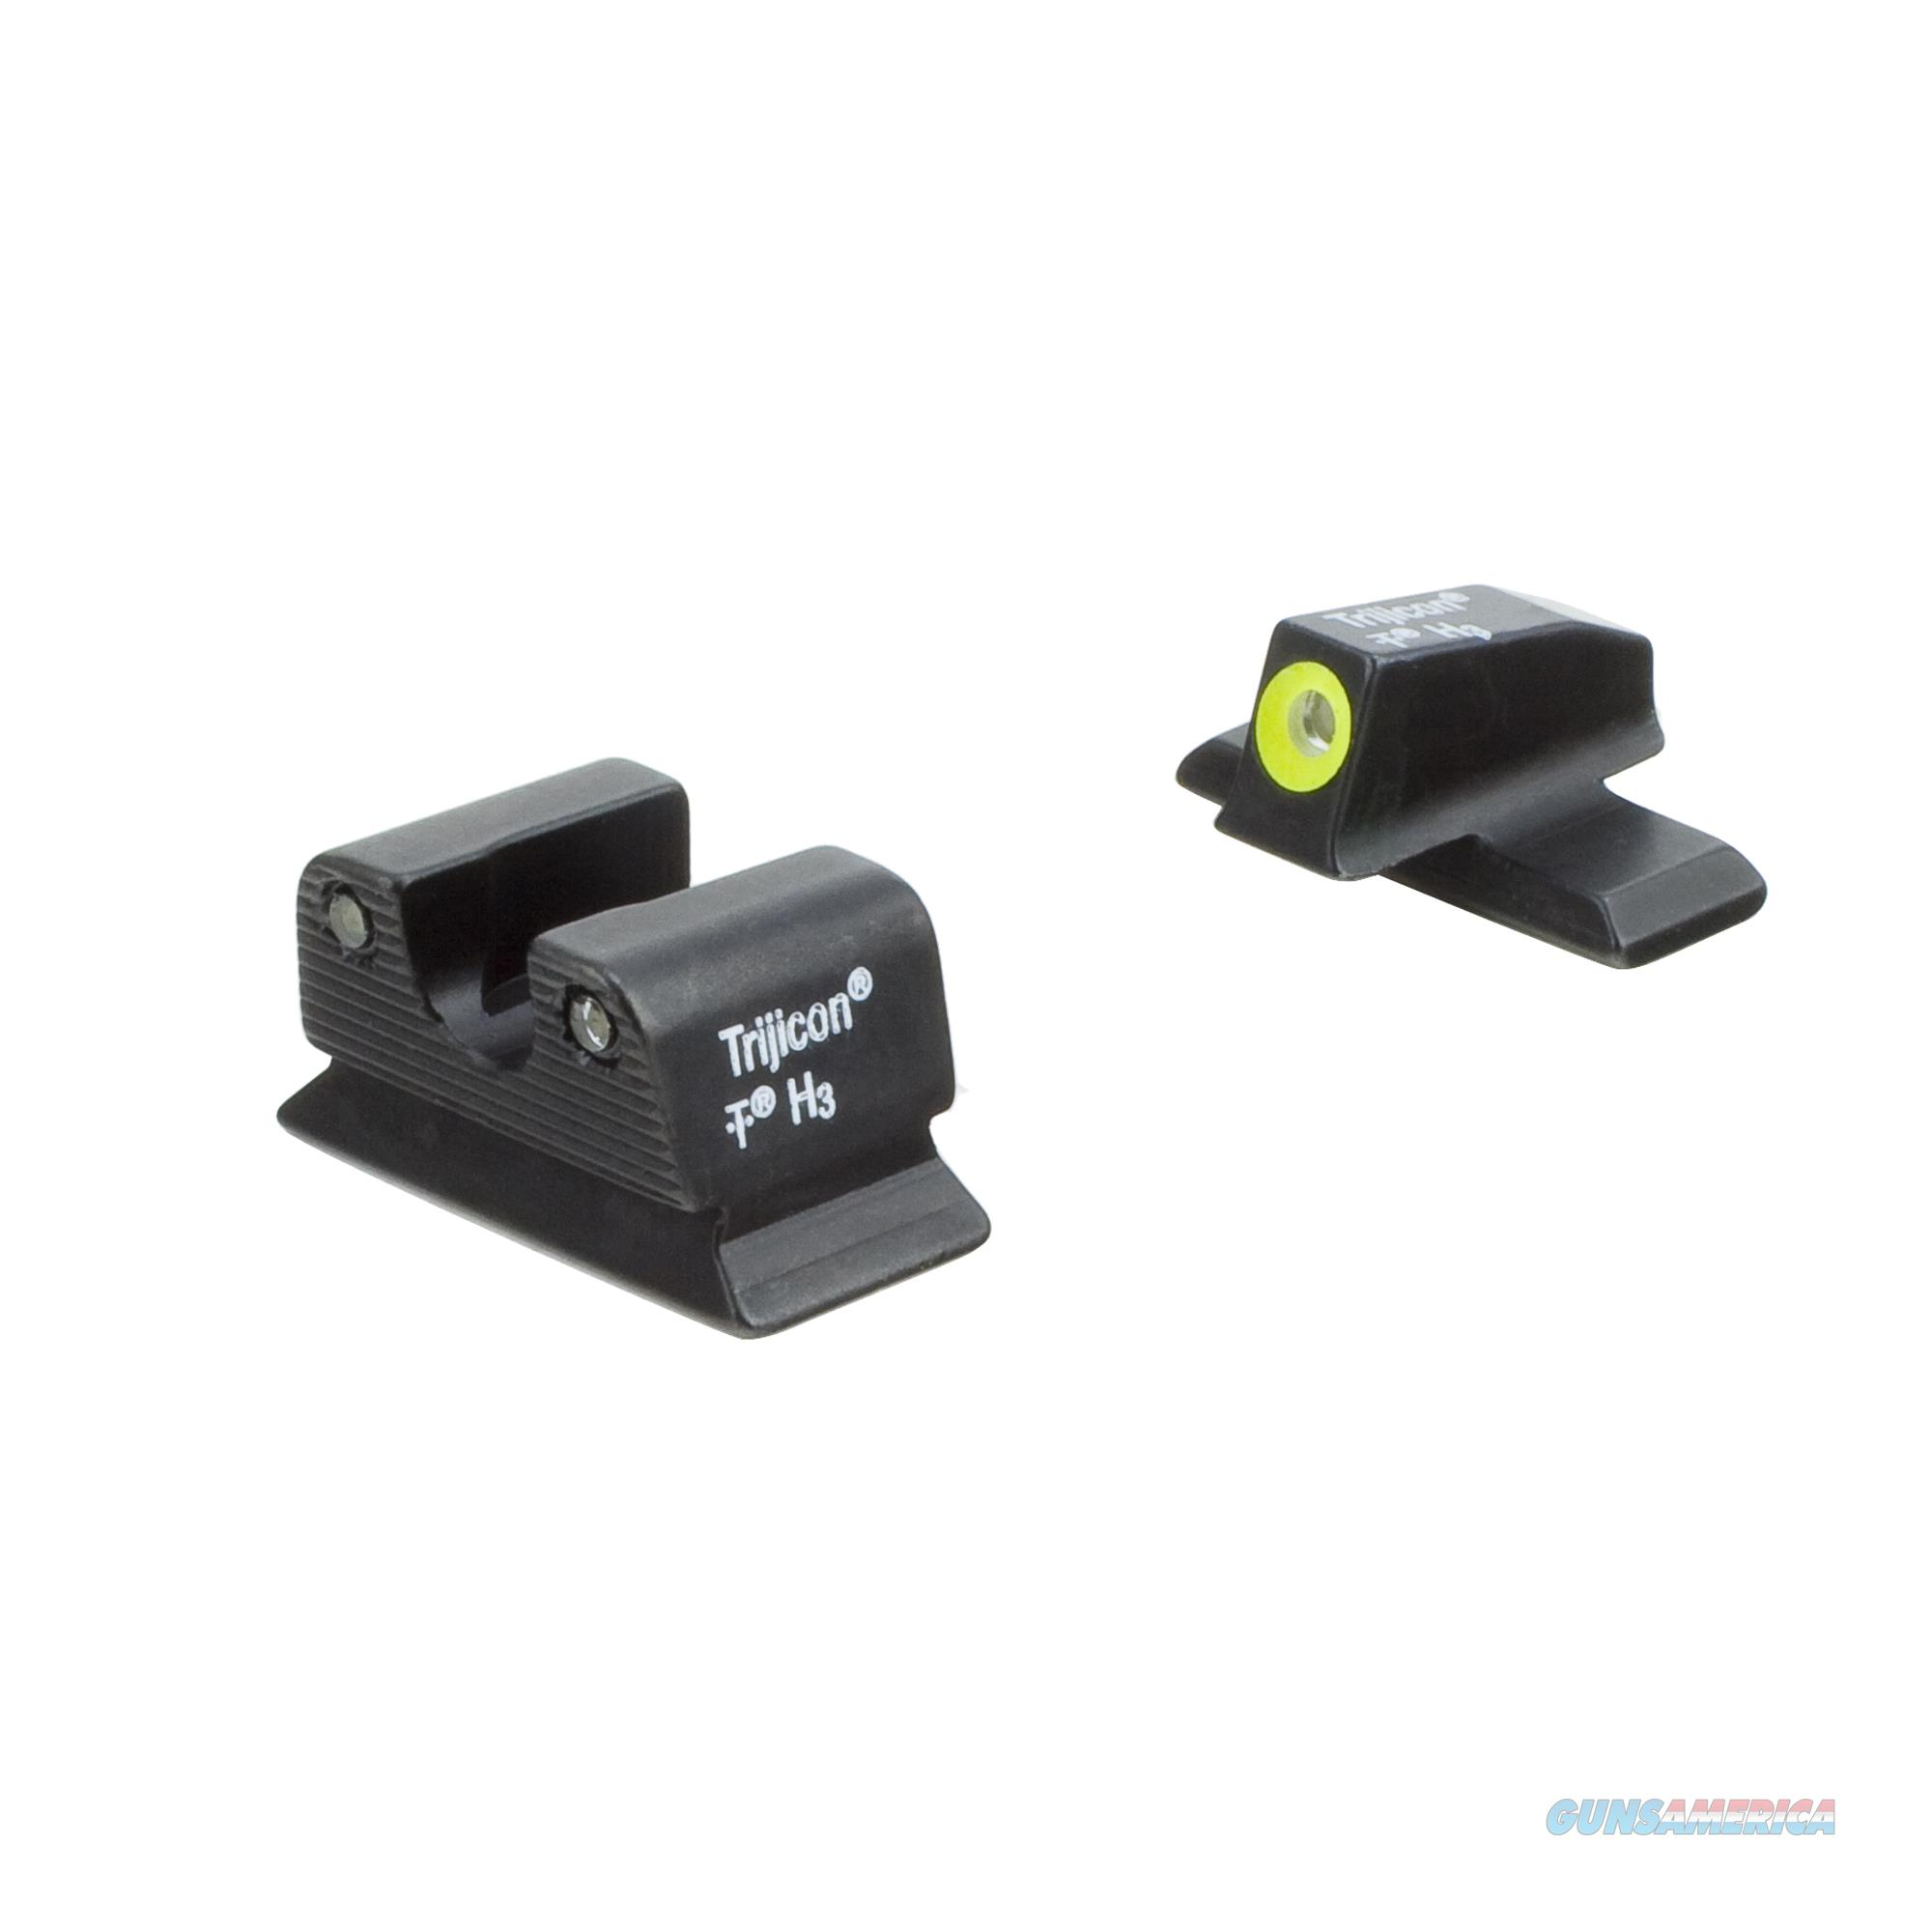 Trijicon Beretta Hd Night Sight Set BE114-C-600772  Non-Guns > Iron/Metal/Peep Sights